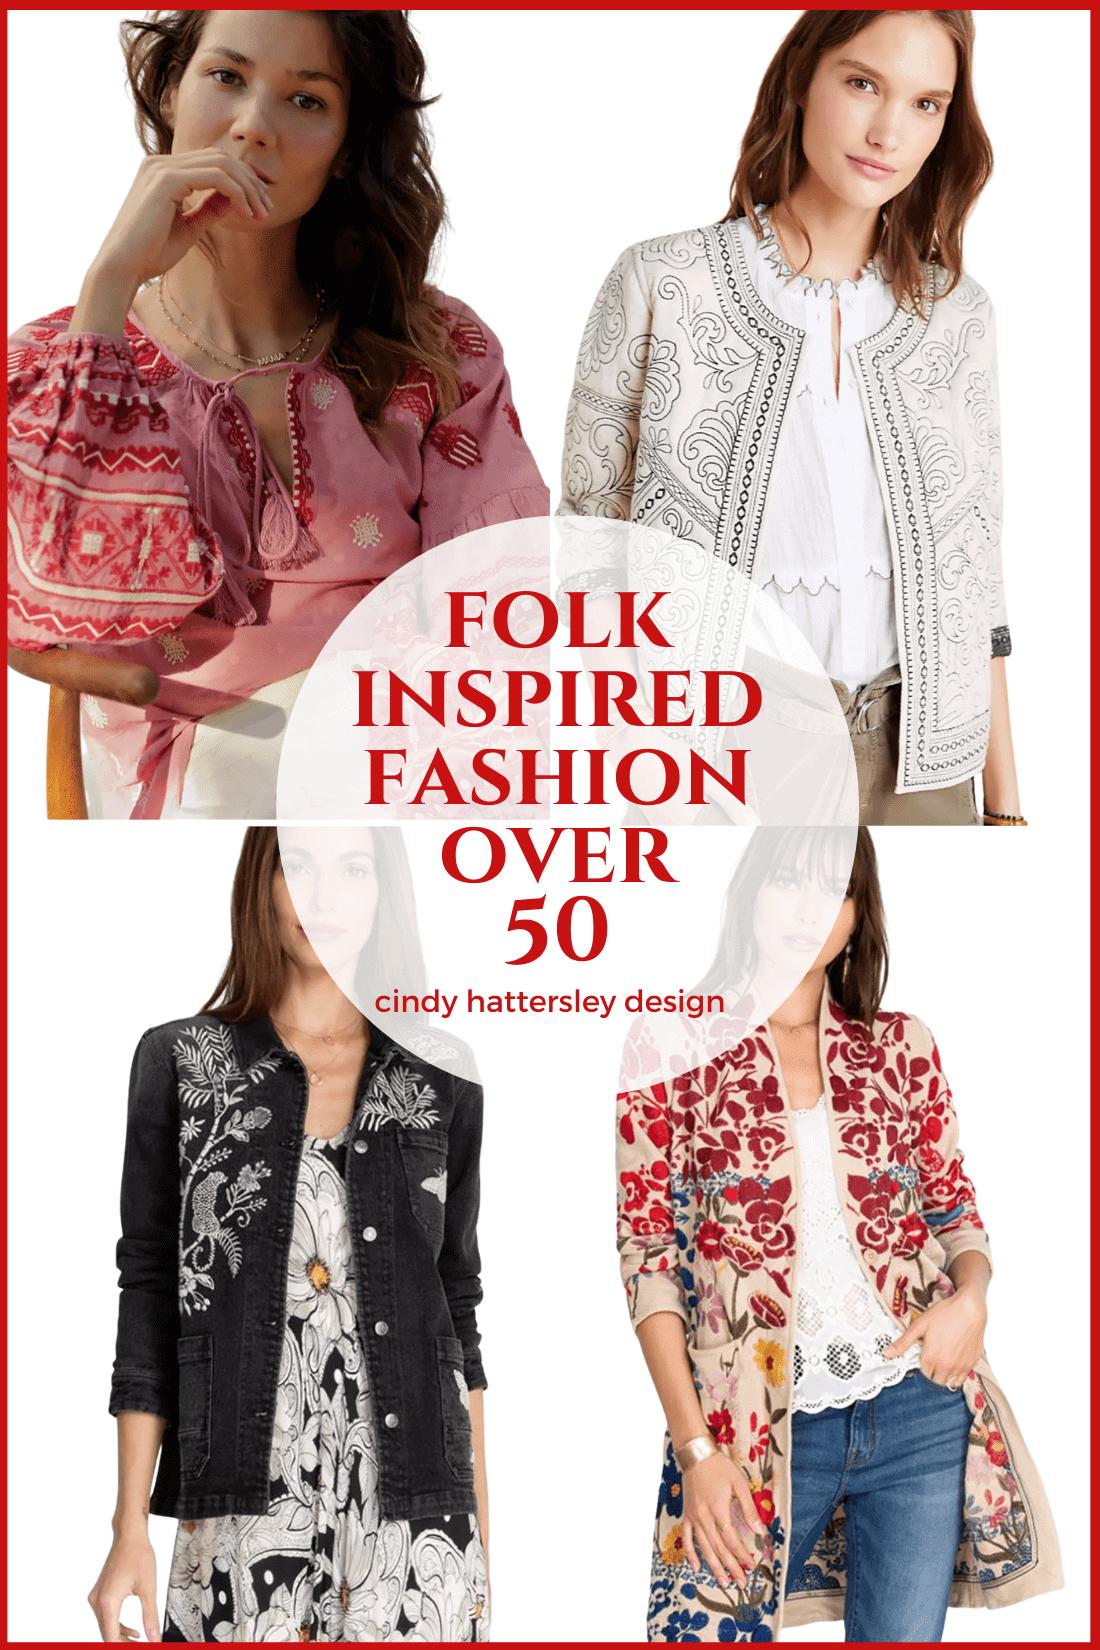 folk inspired fashion over 50